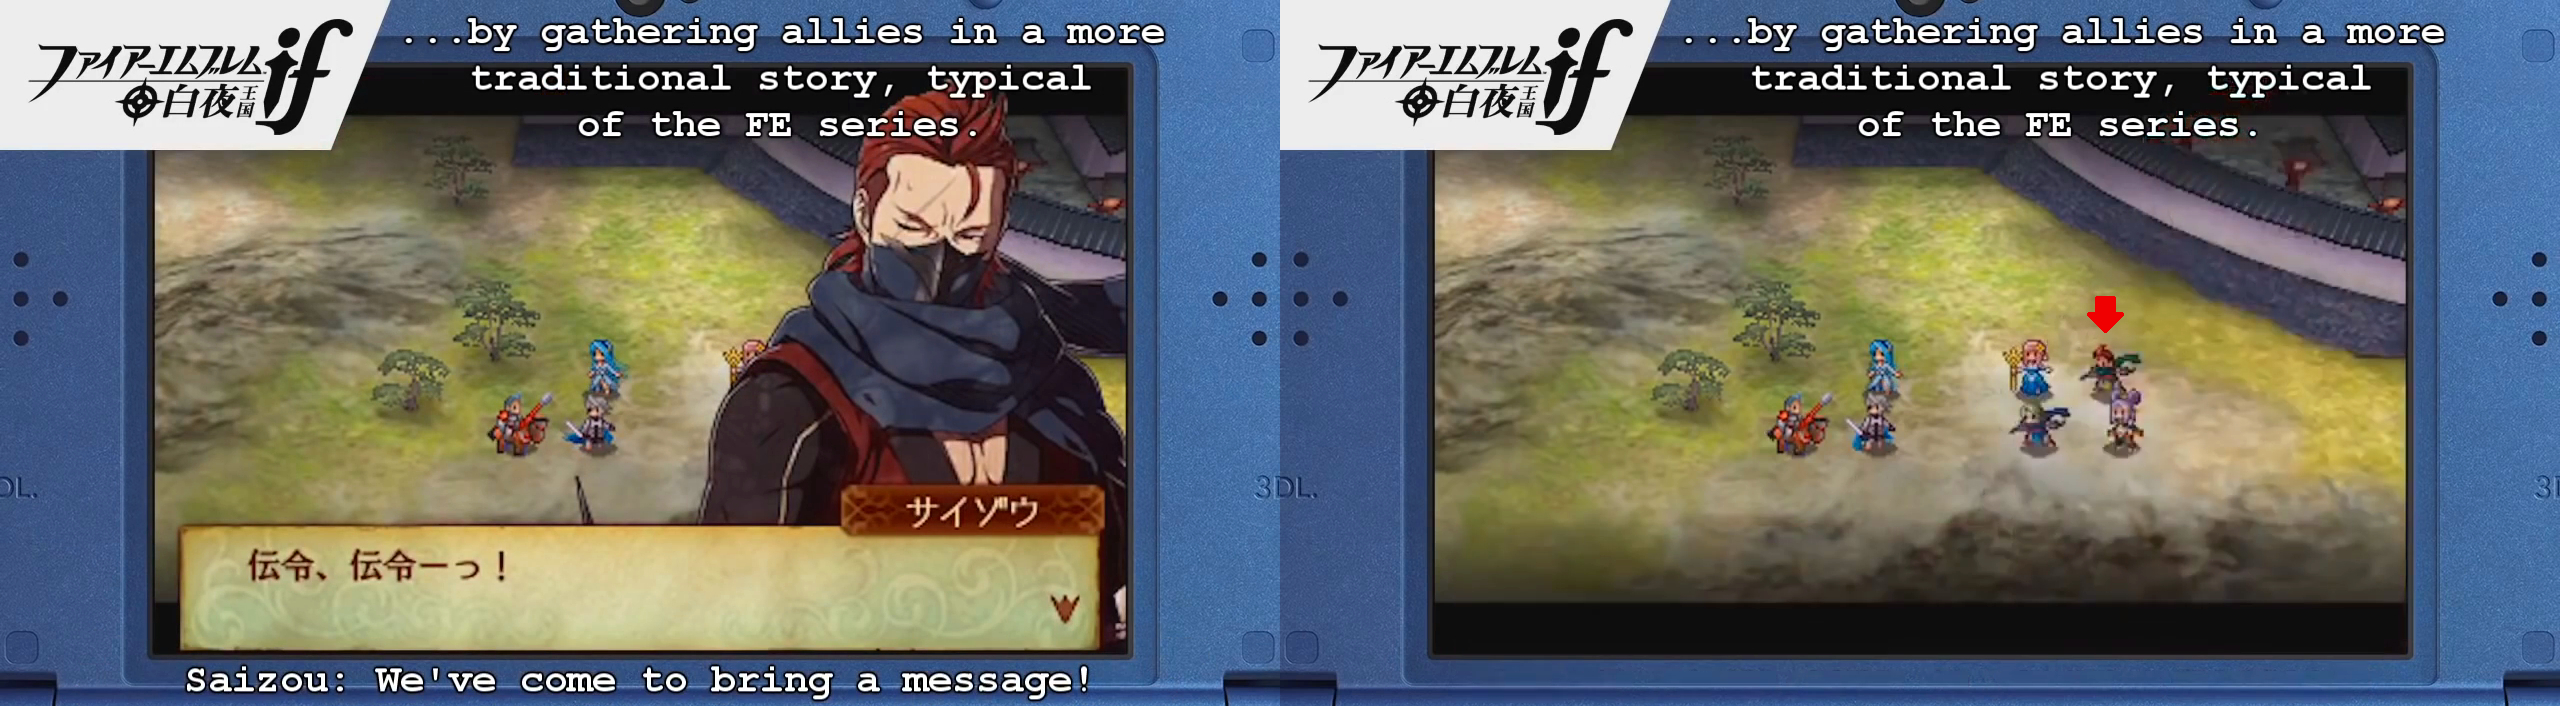 Saizou, the ninja accompanying Orochi.